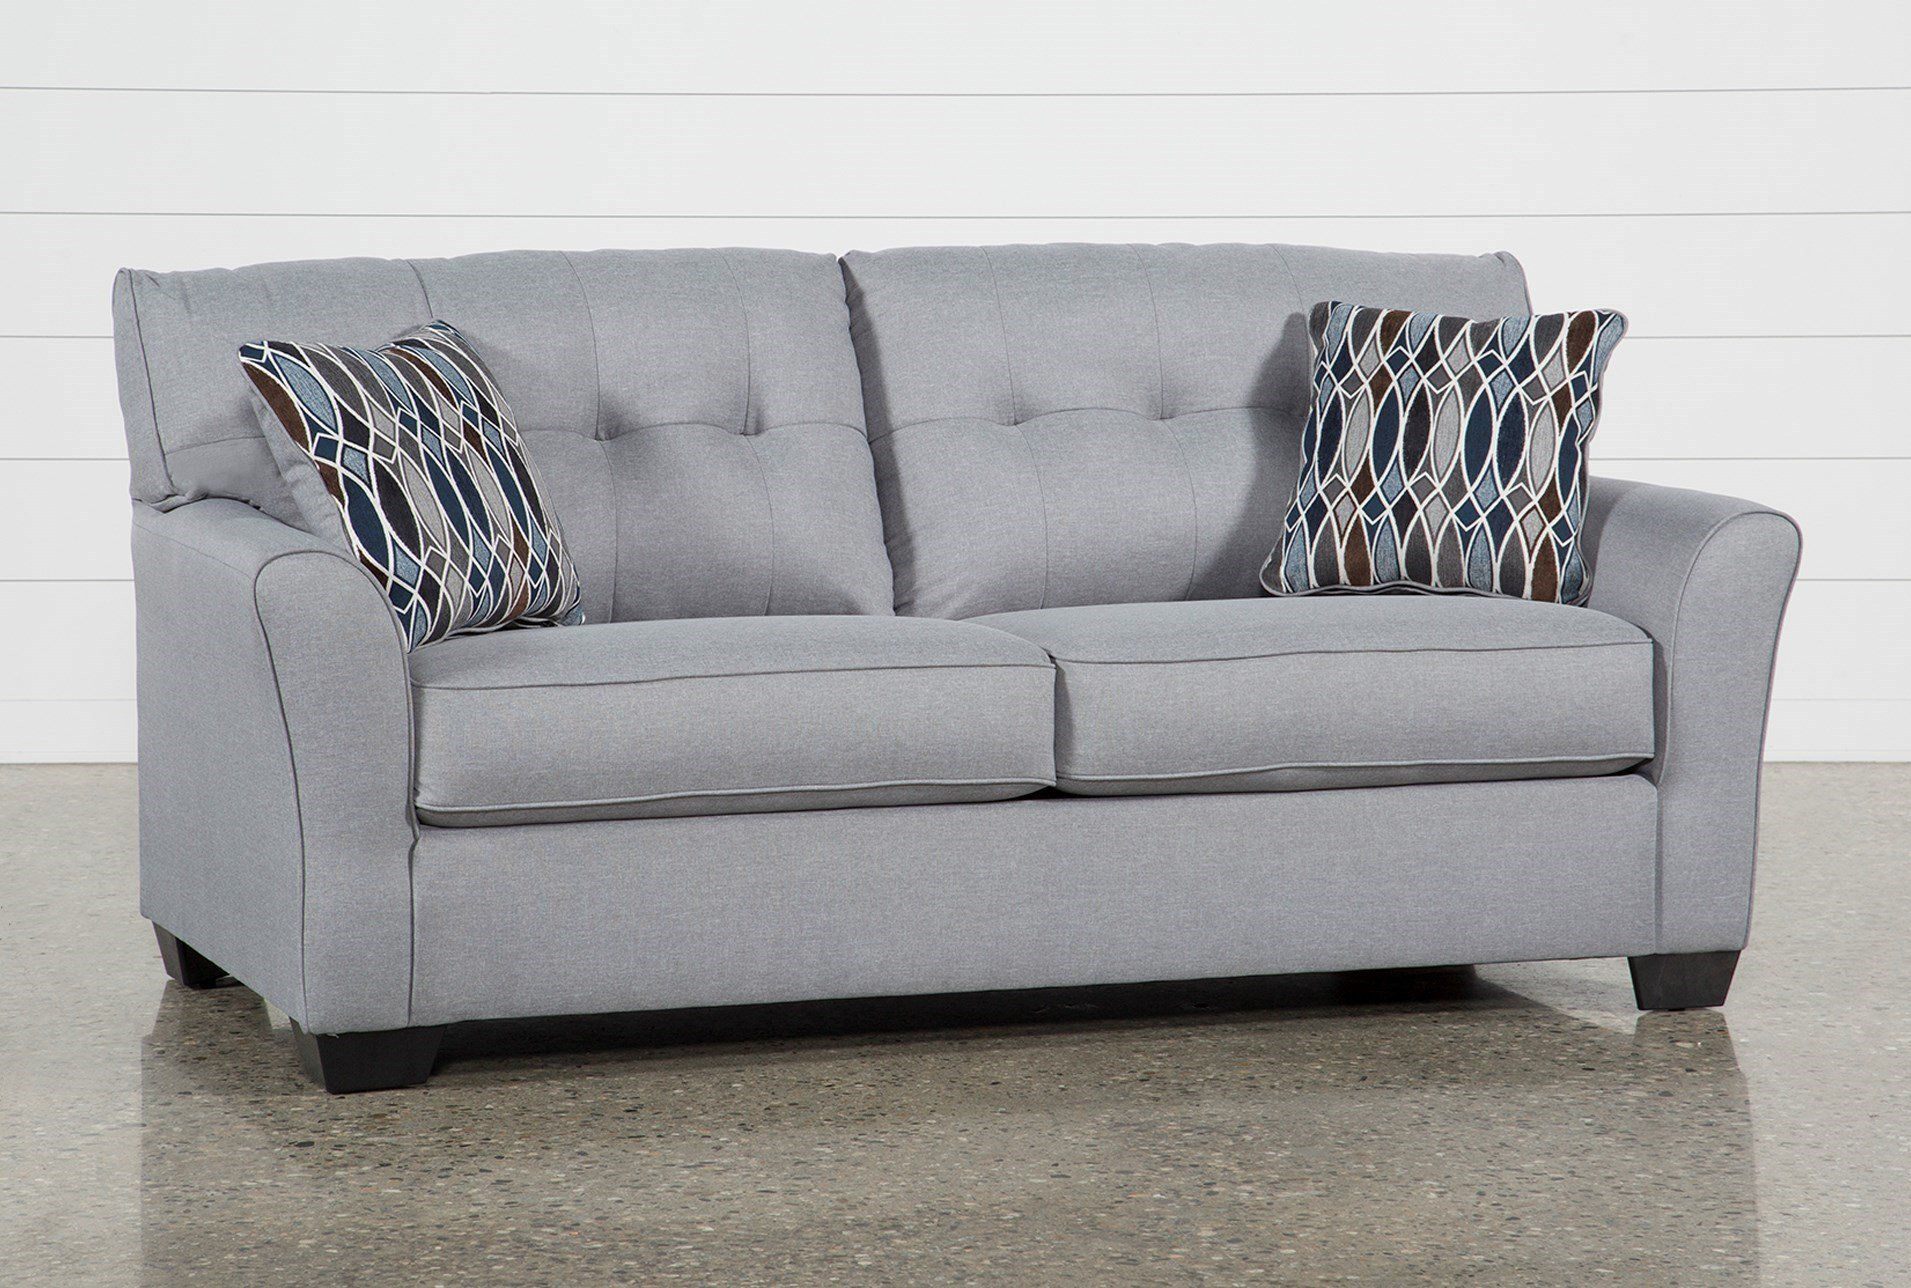 Shop For Chilkoot Smoke Full Sofa Sleeper At Livingspaces Com